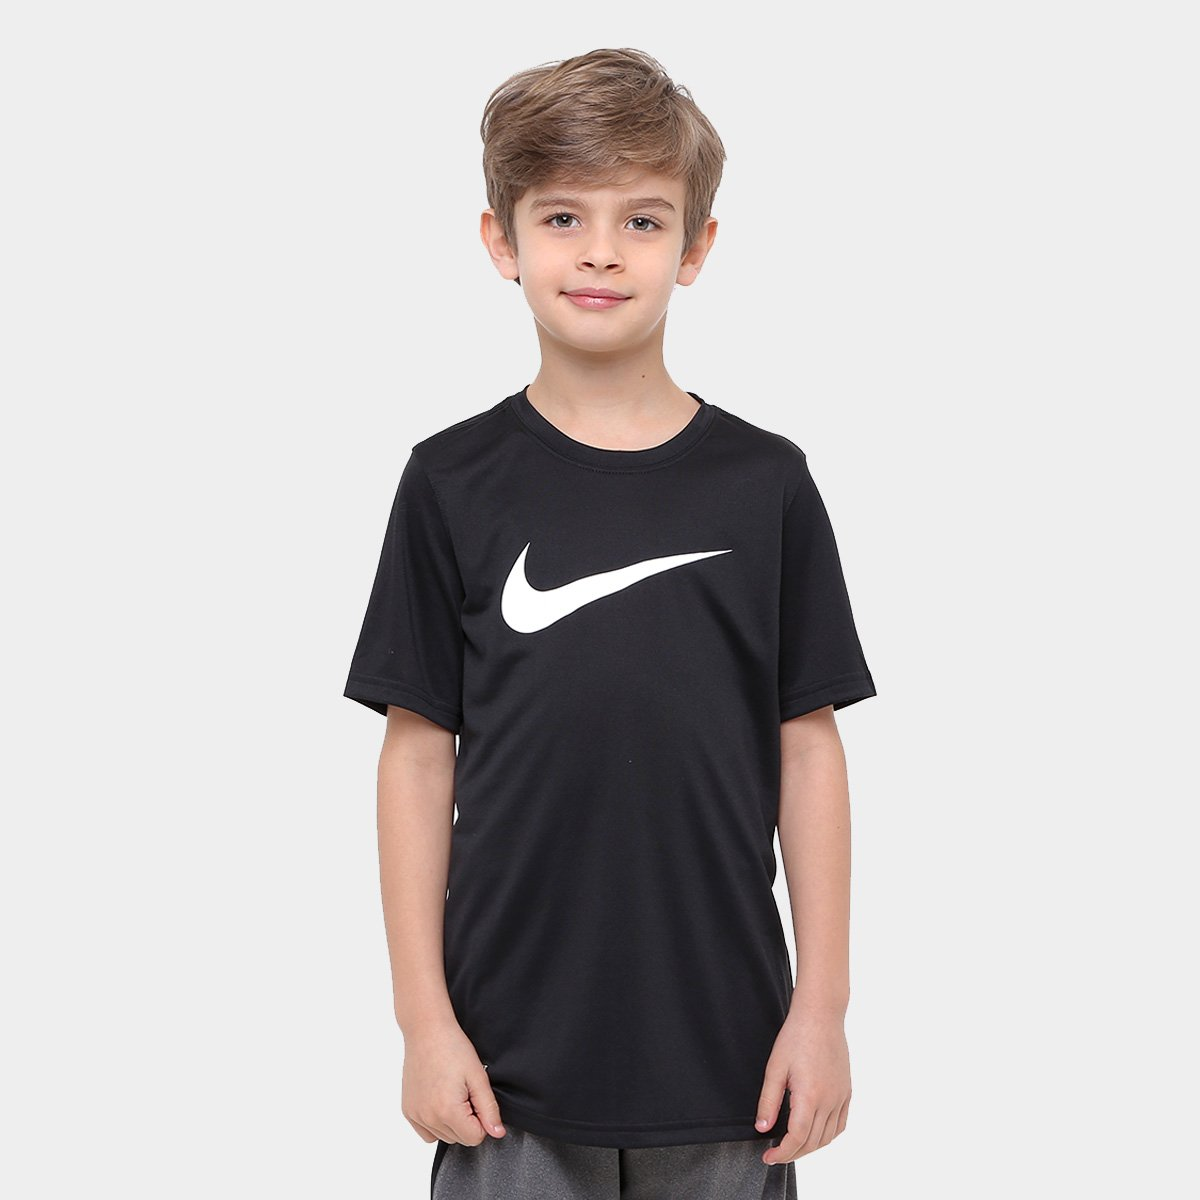 Camiseta Infantil Nike Dry Tee Ss Swoosh Solid Masculino - Compre ... d70f6efe882db